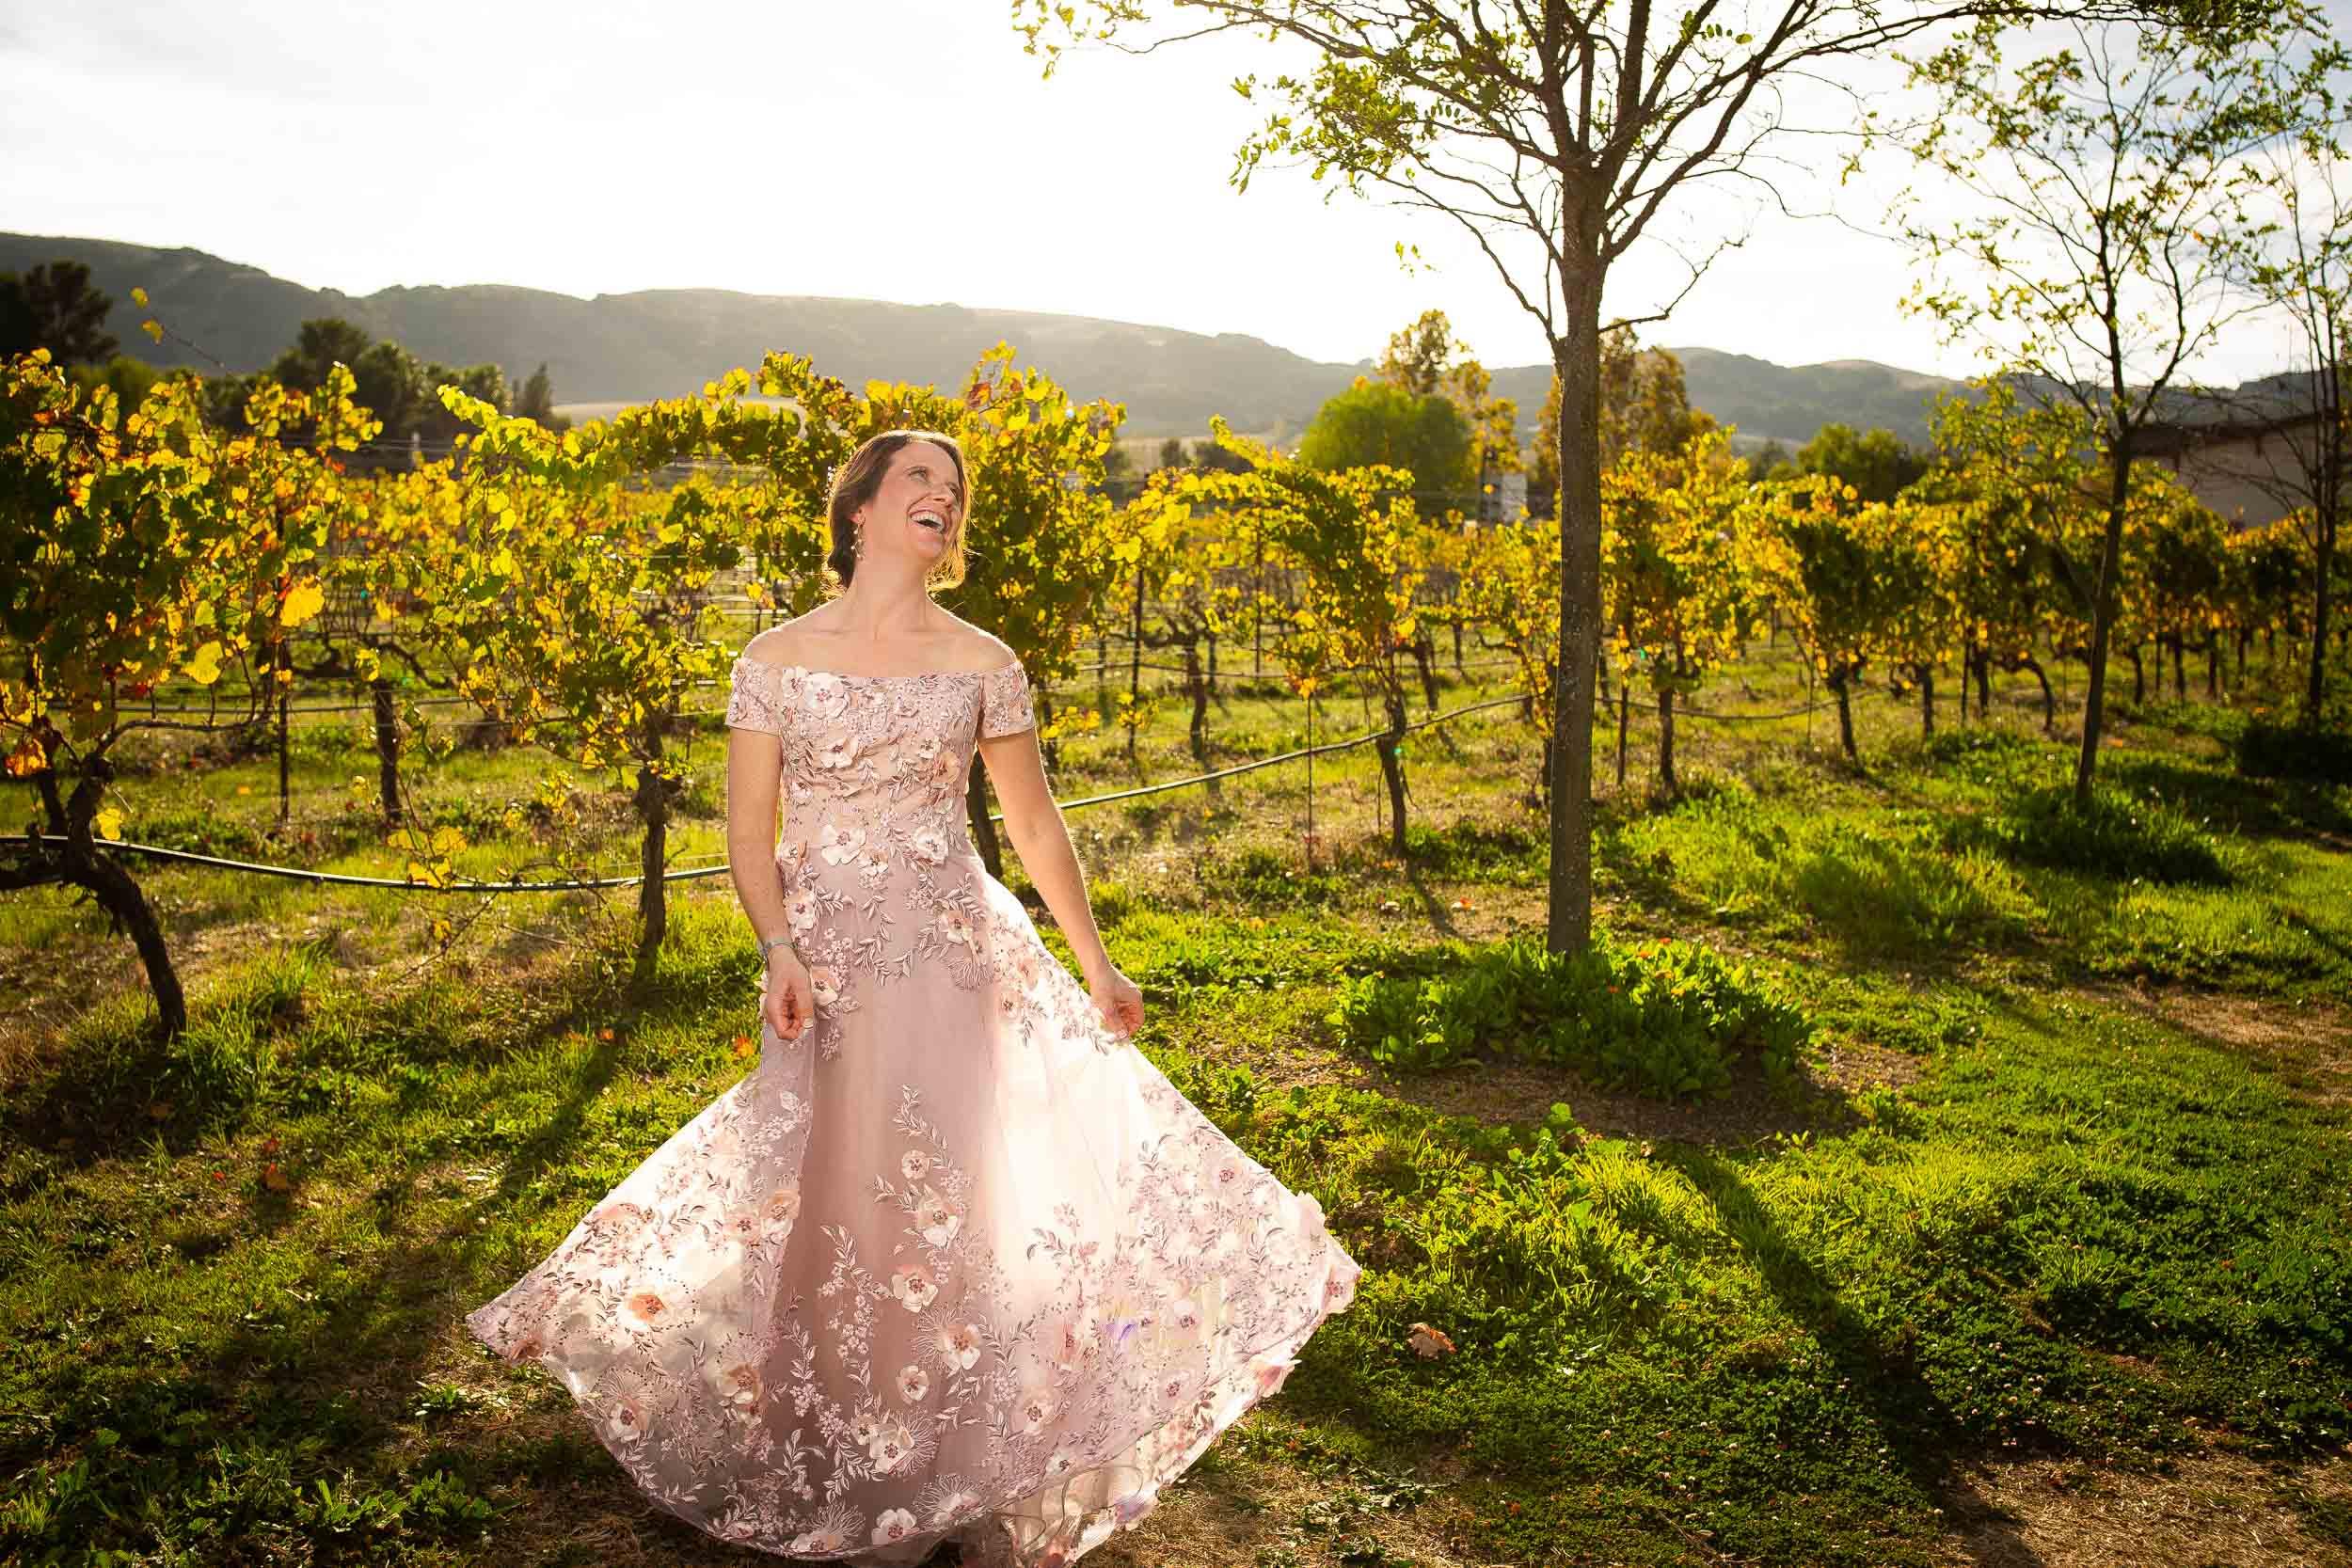 Jacuzzi Family Vineyards Wedding Photos-16.jpg